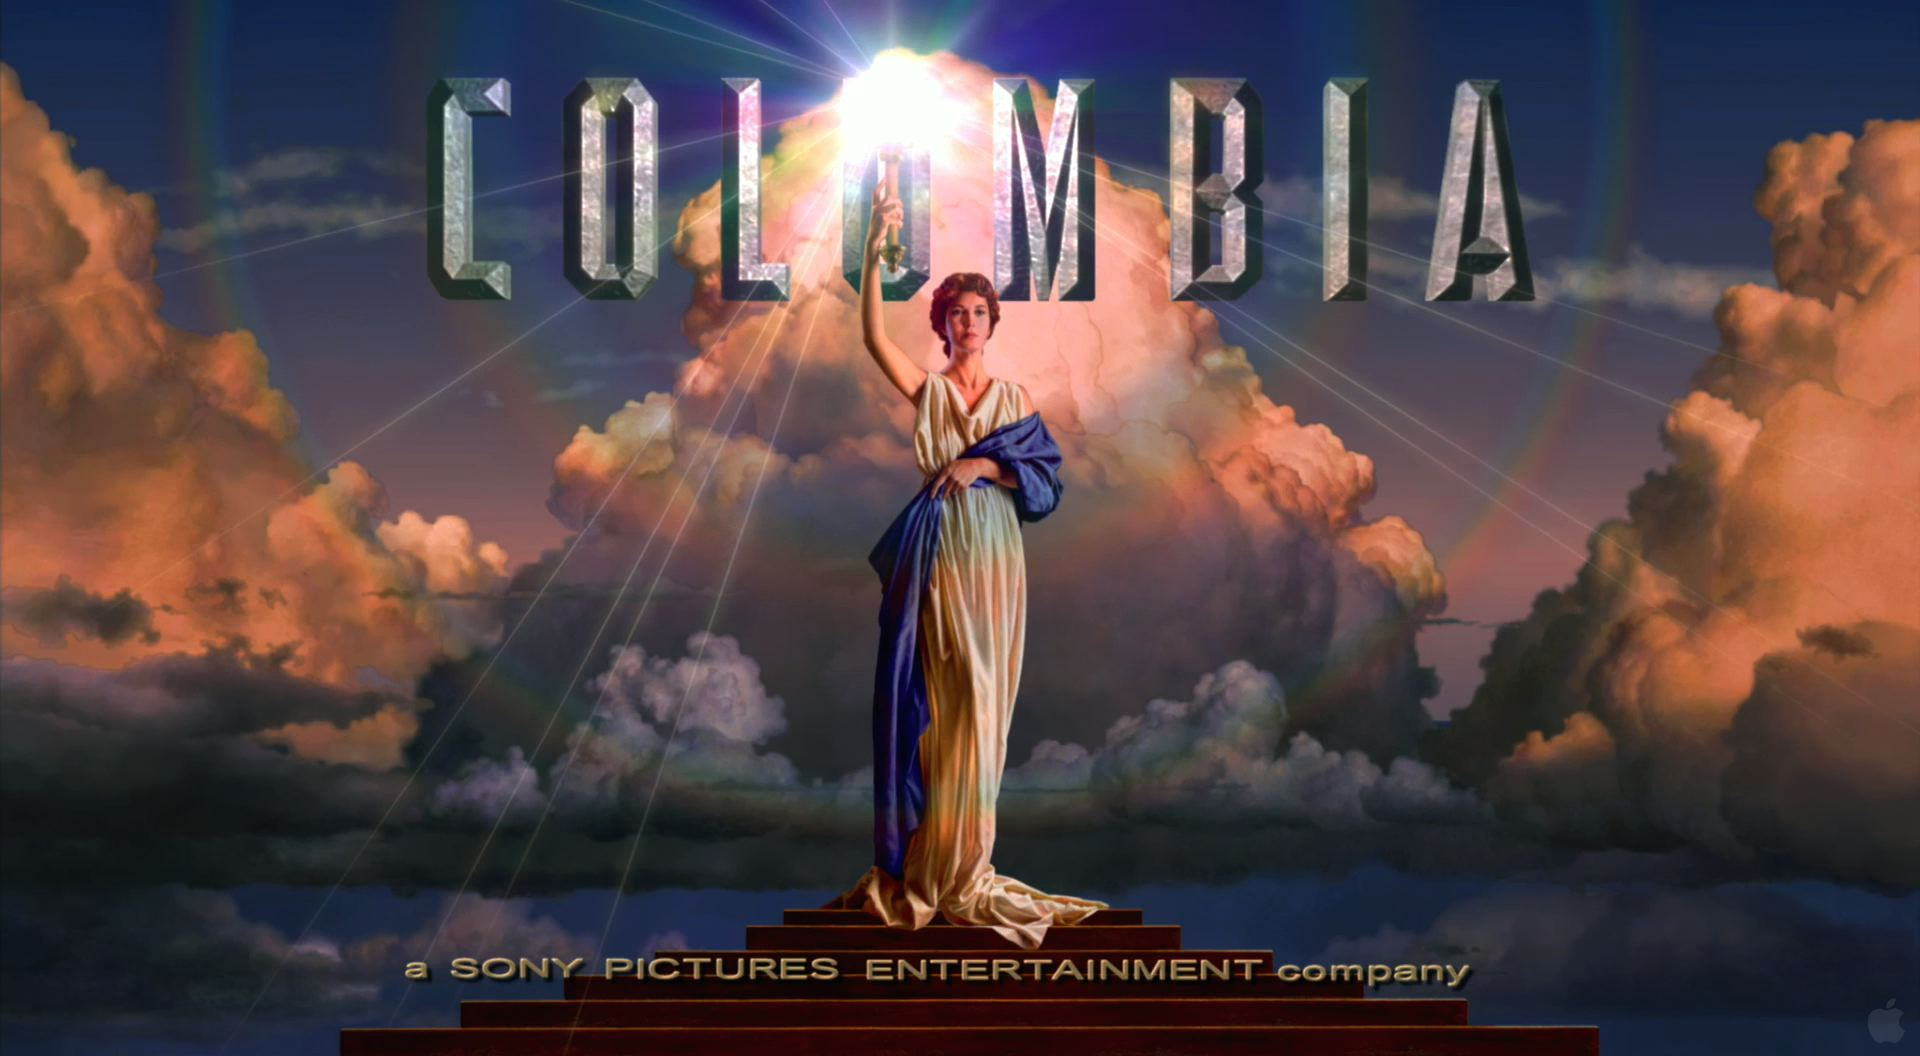 Columbia Pictures Symbolism | Truth Control